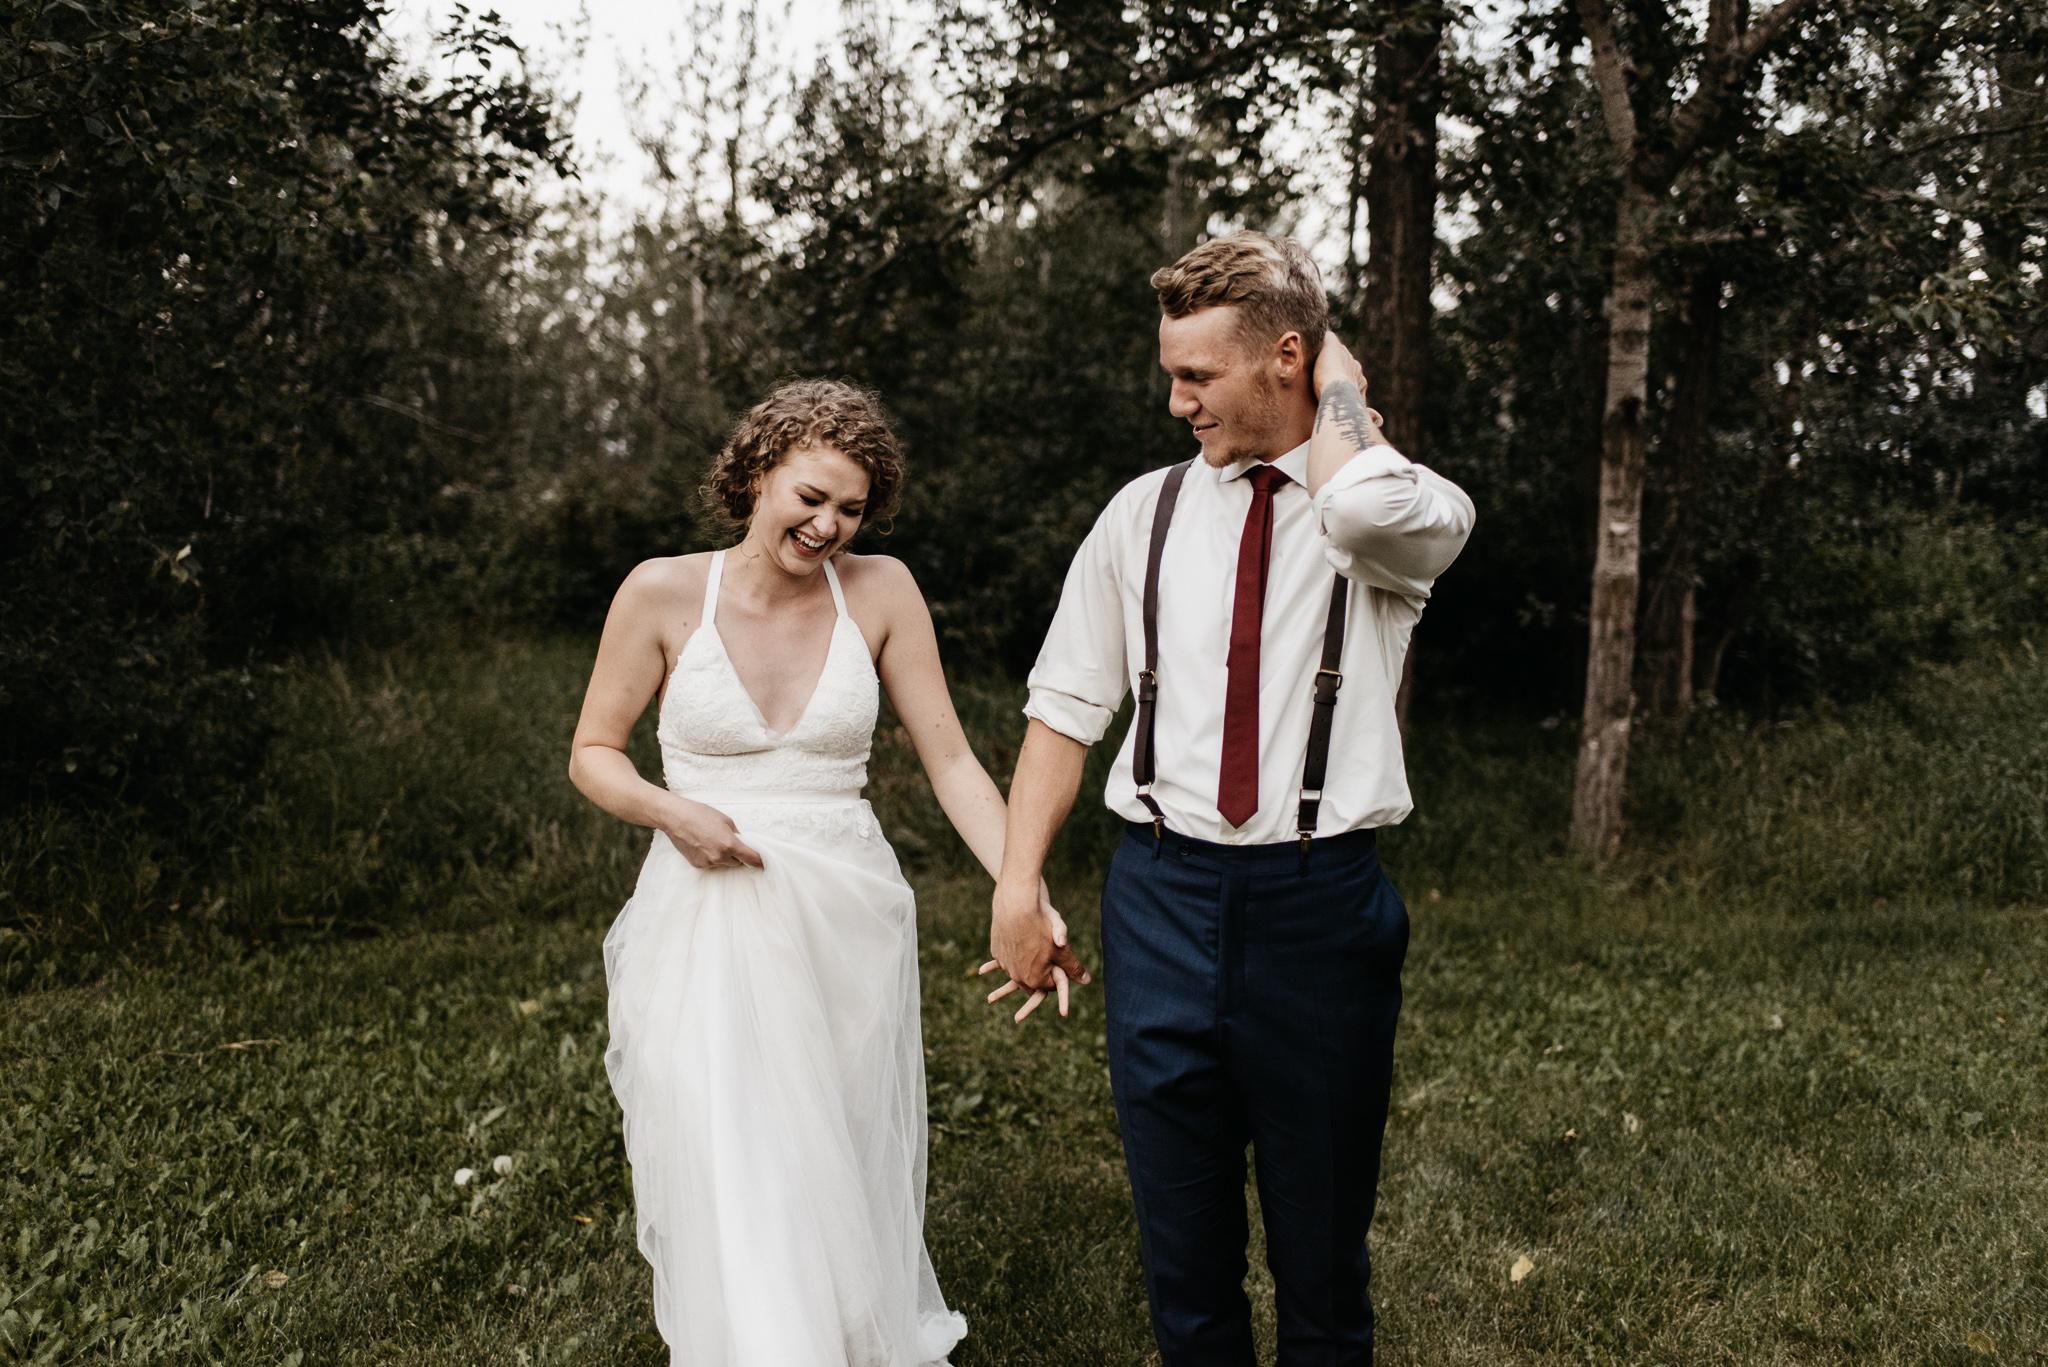 J&C-Weddingblog-112.jpg